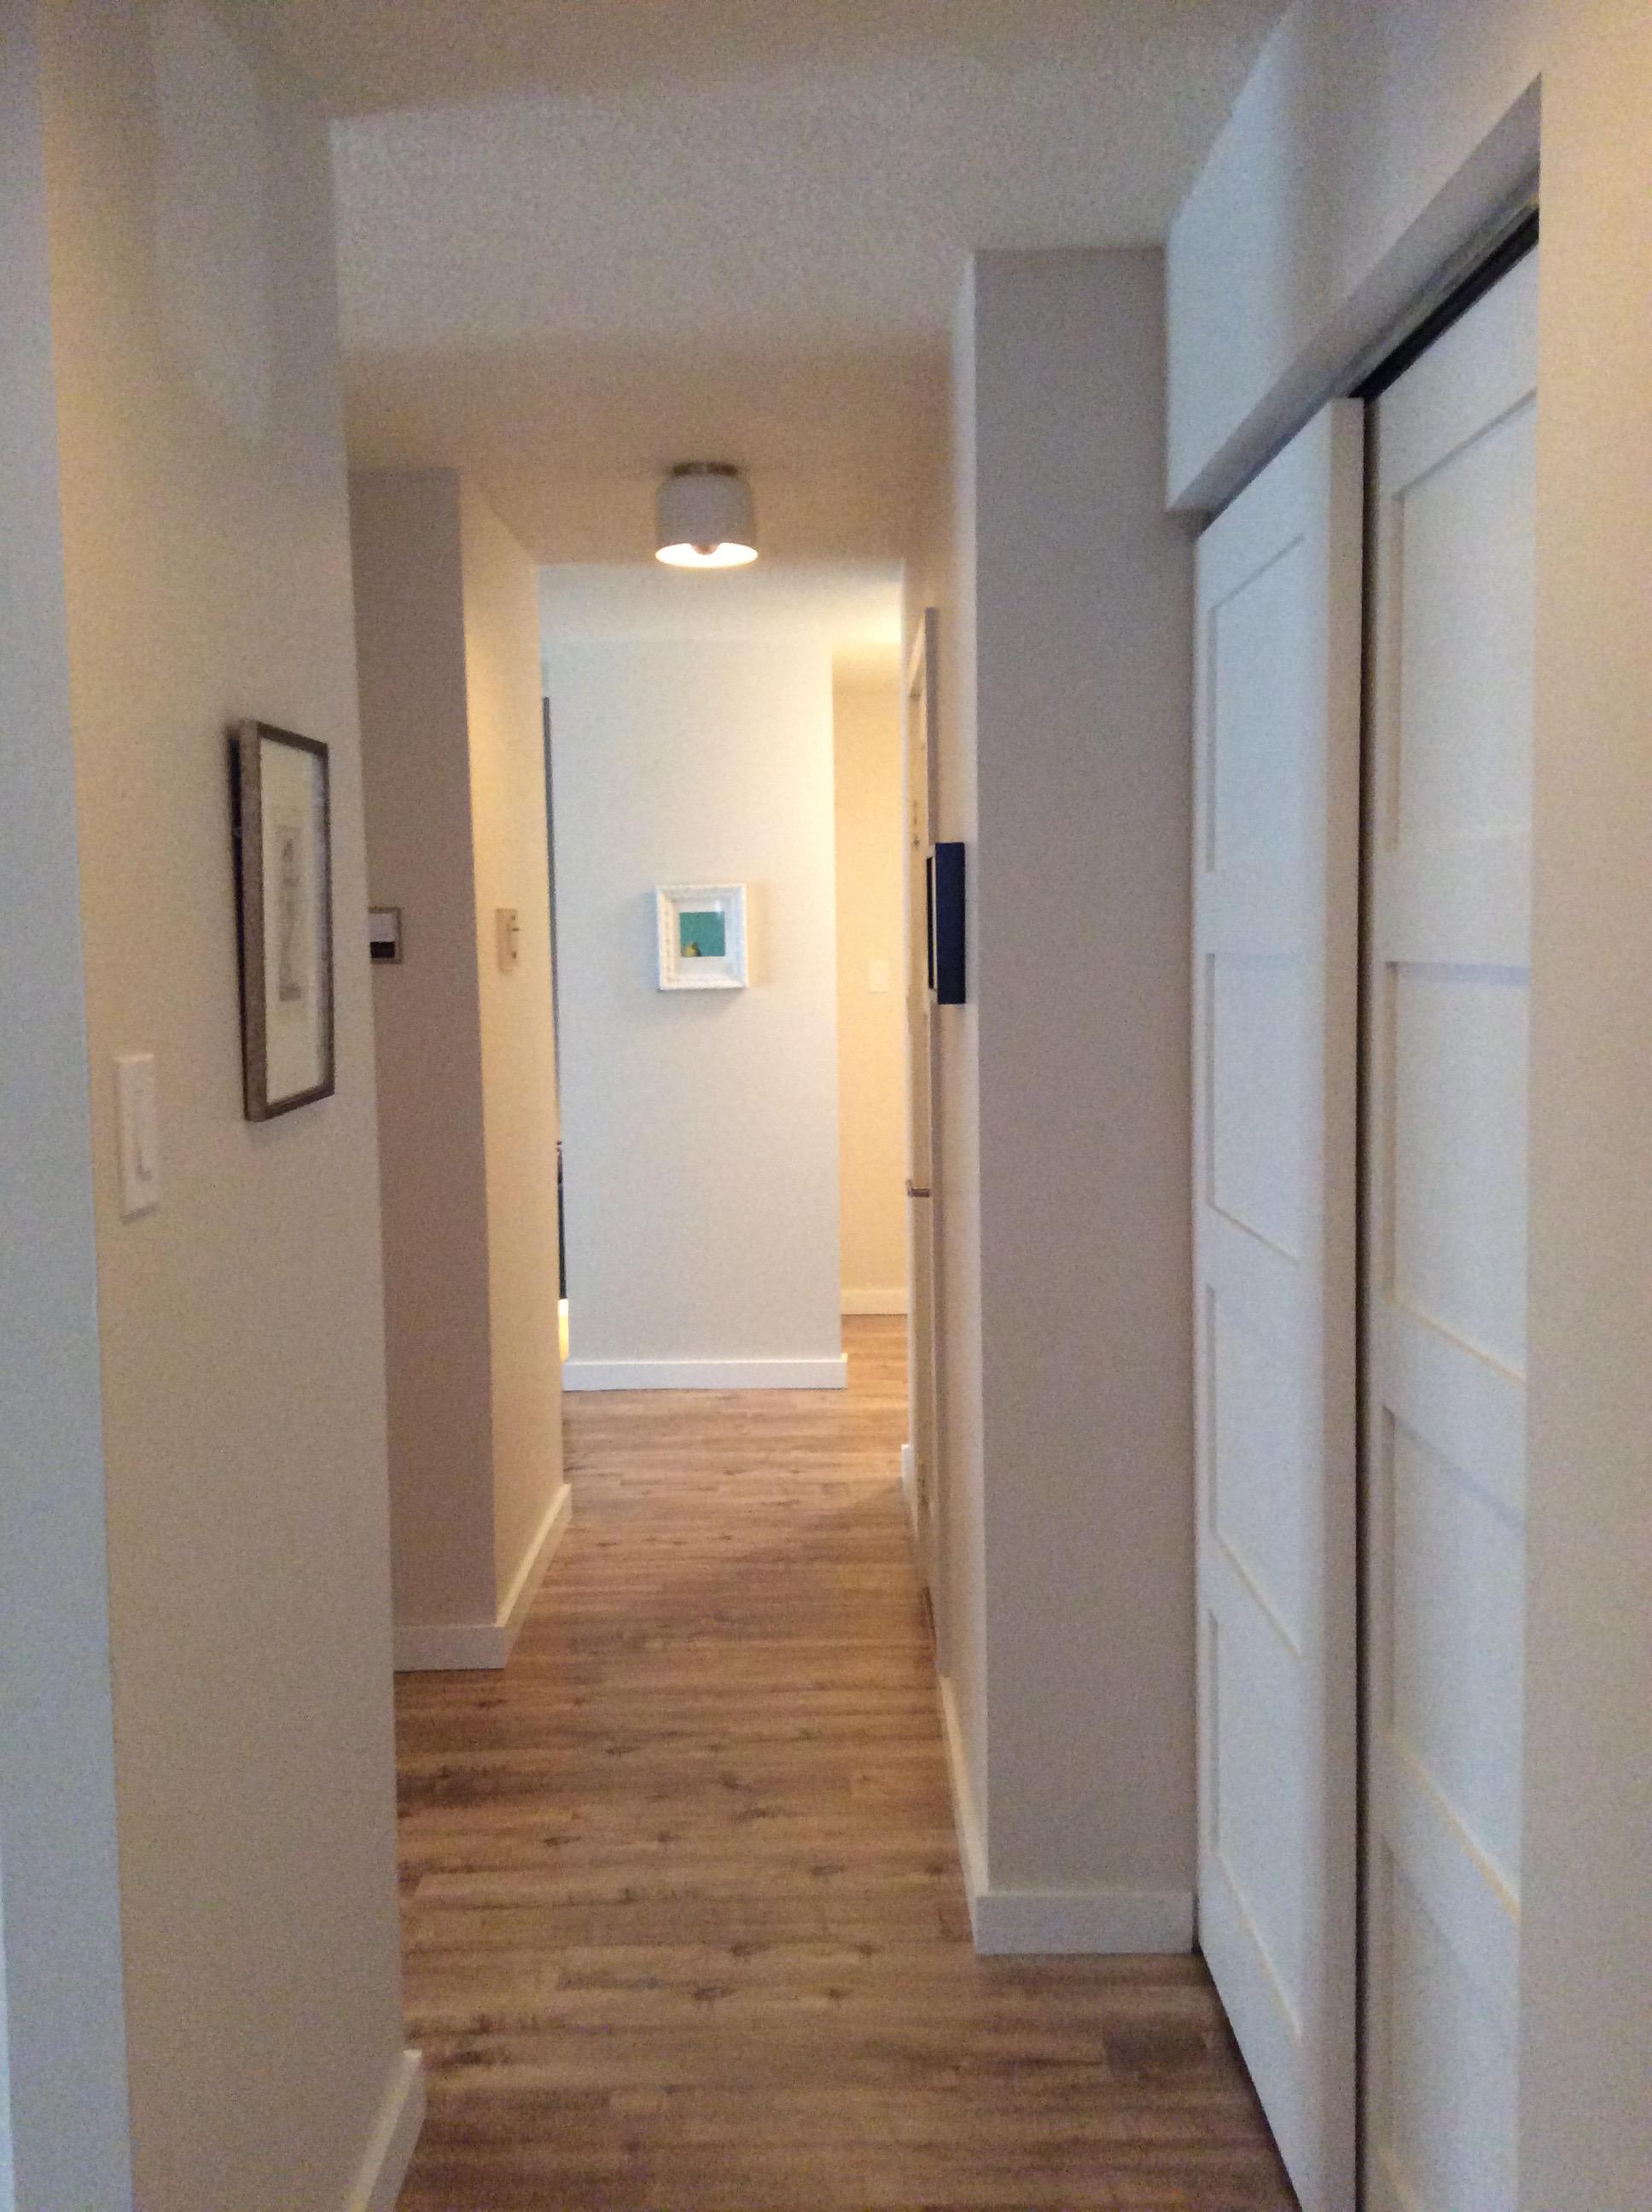 CB2 light fixtures, sliding barn style closet doors, laminate flooring.